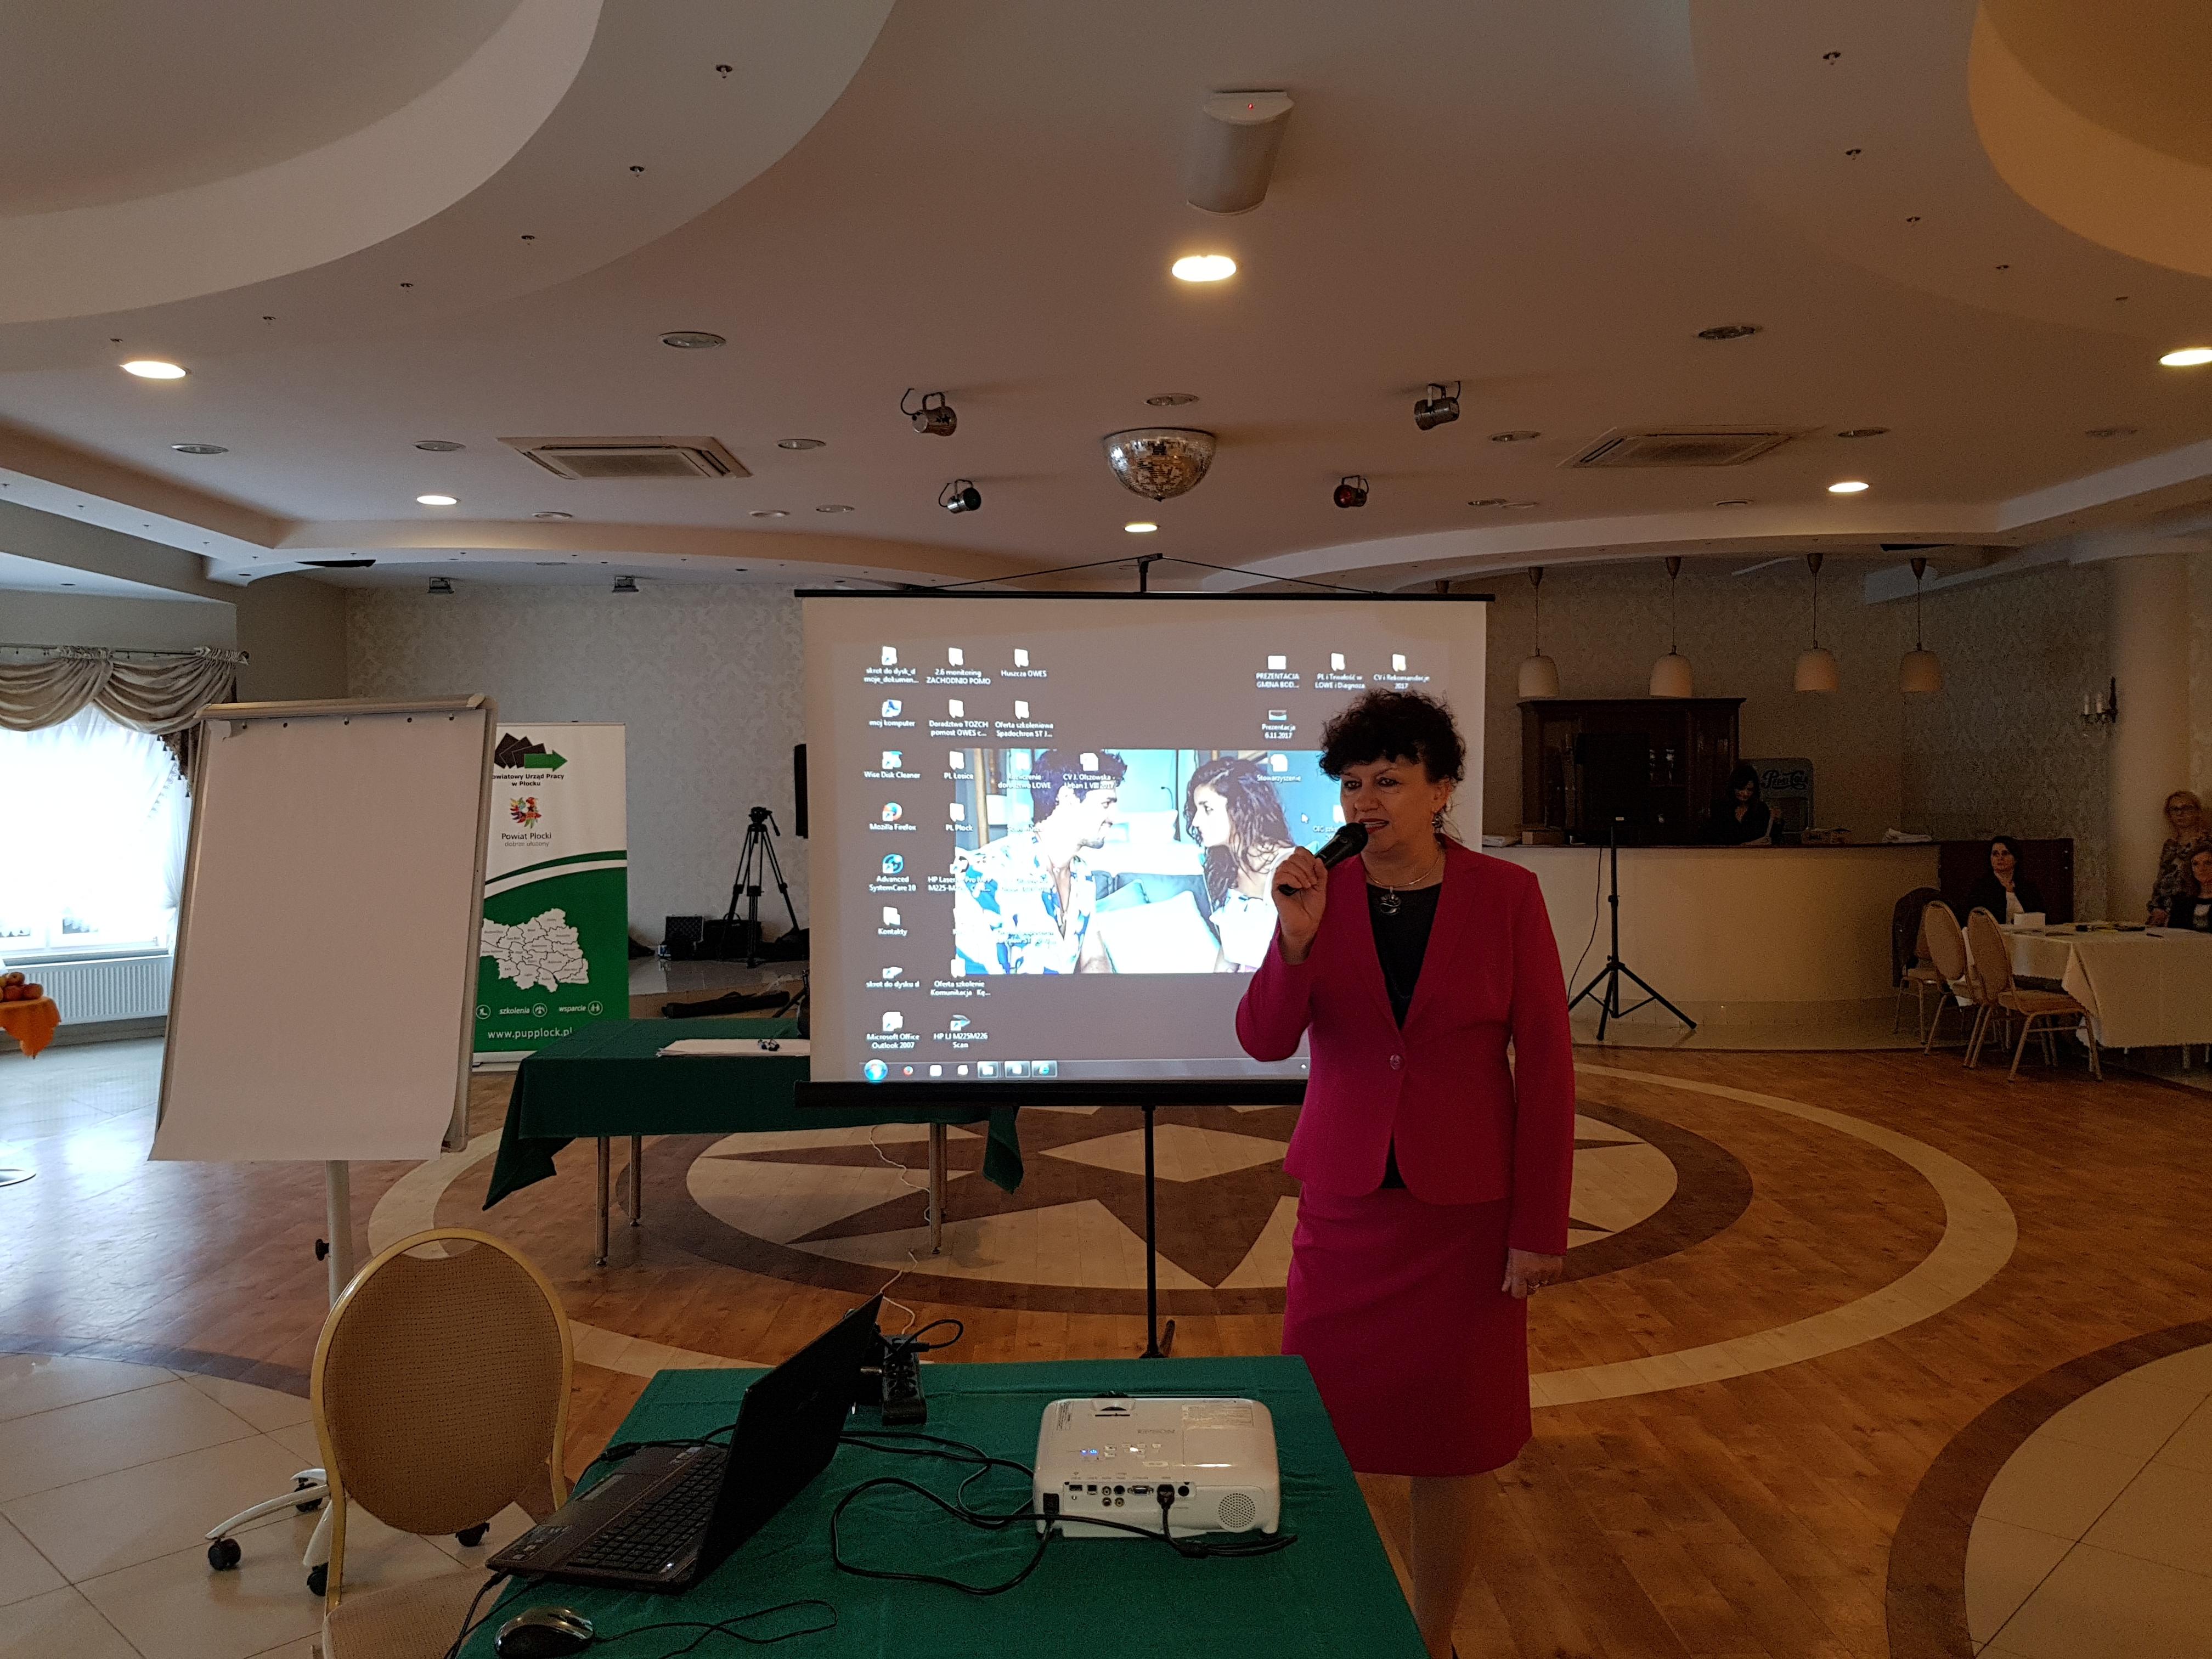 Partnerstwo dla pracy V Konferencja 6.11.2017-2